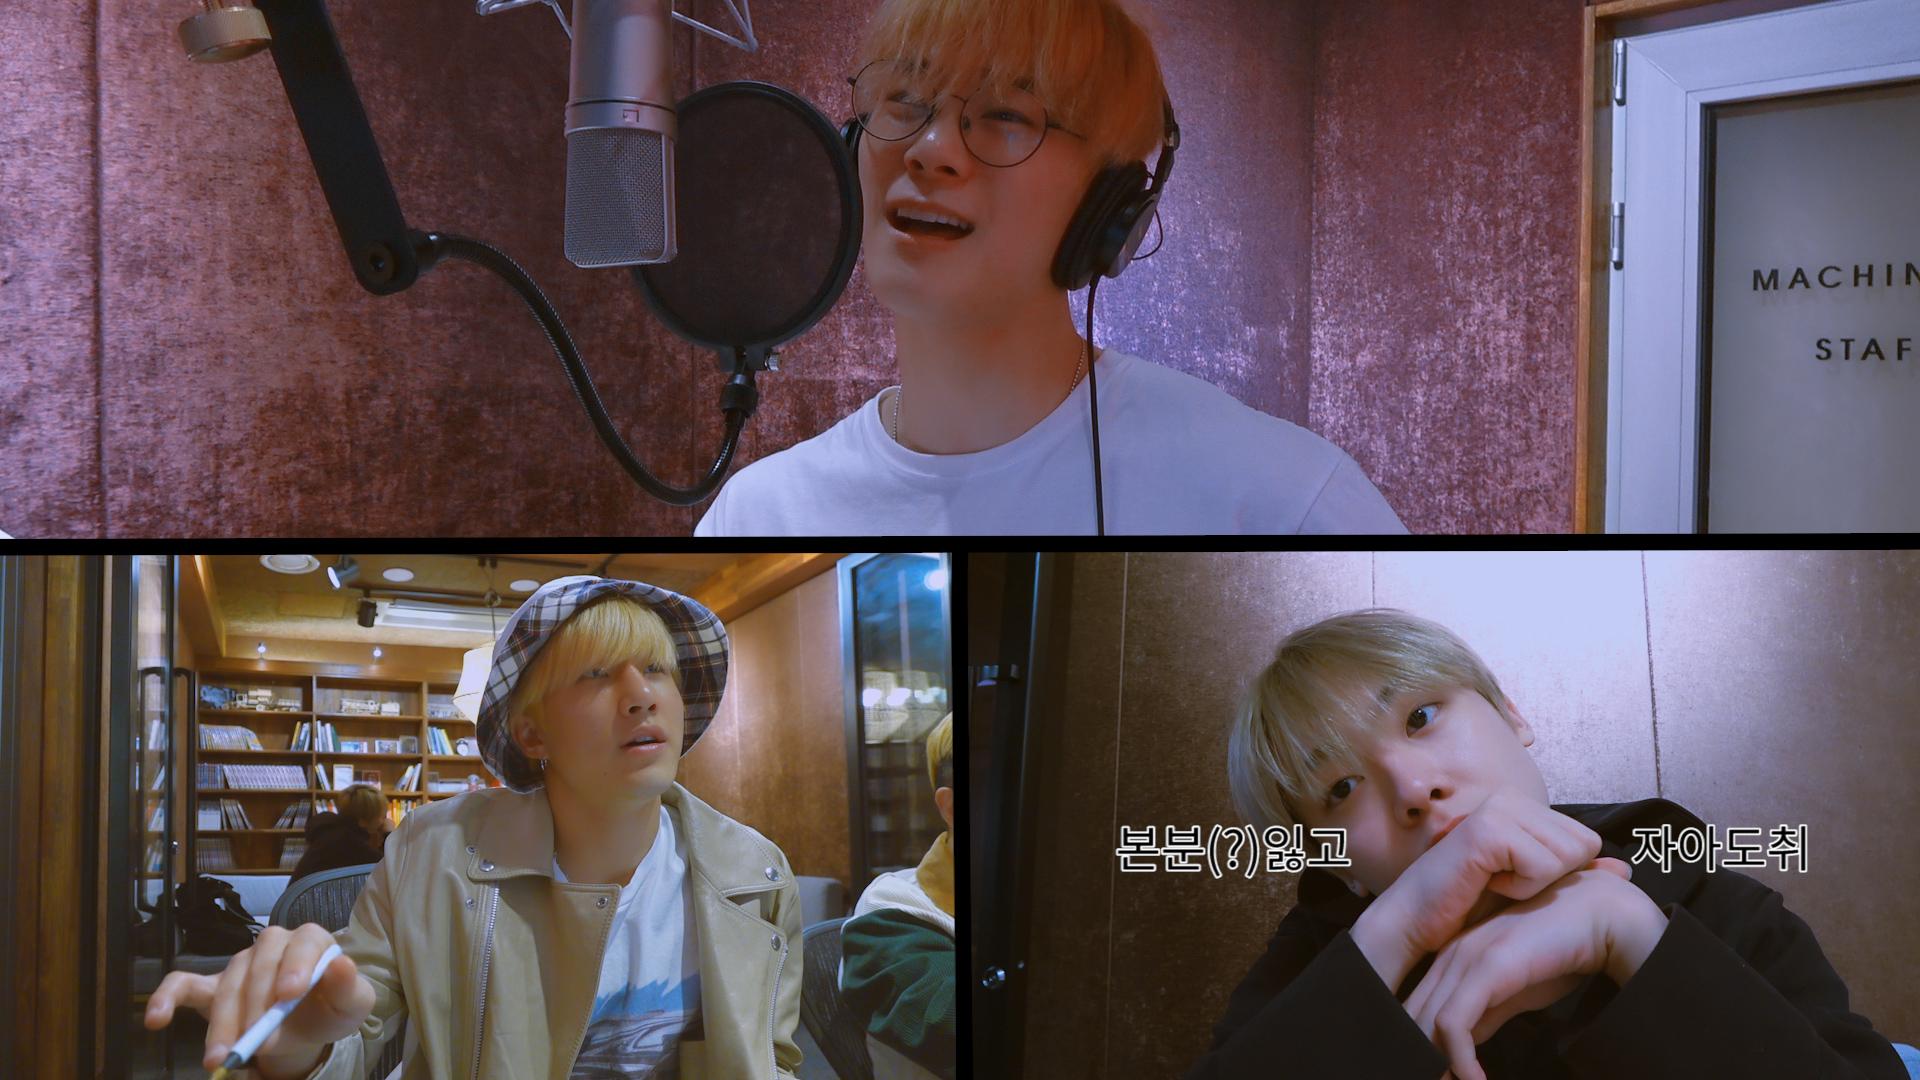 [ASTRO PLAY] ✨빛이 돼줄게✨ ft. 또까